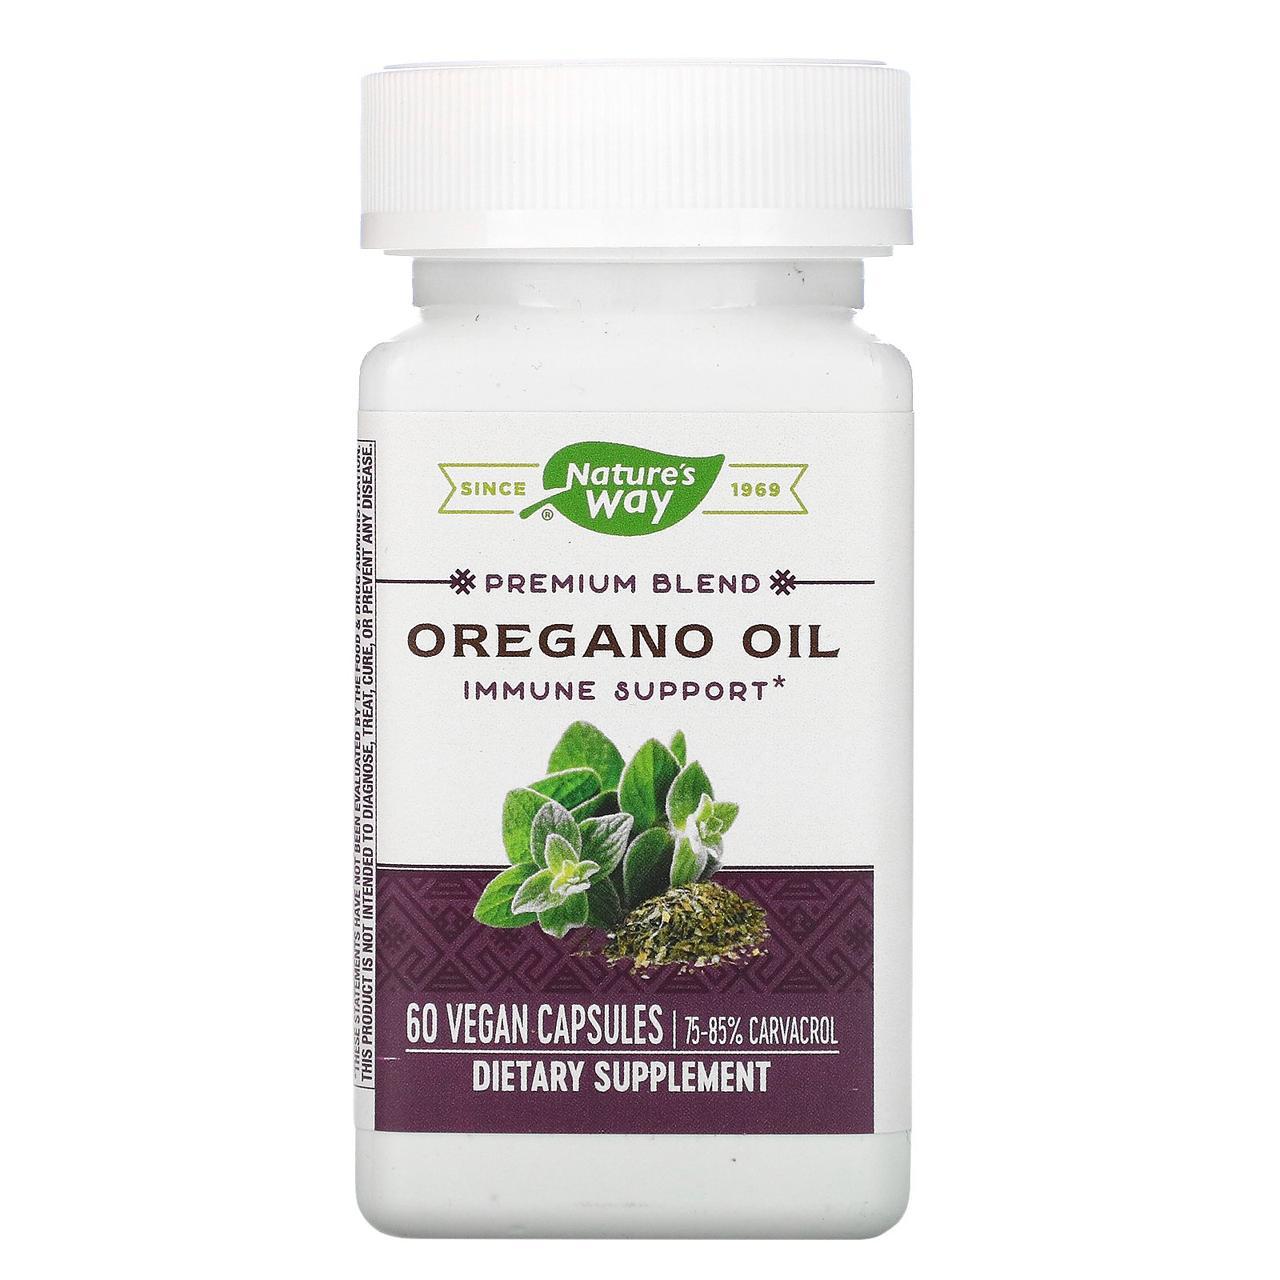 Масло орегано (Oregano Oil), nature's Way, 60 капсул